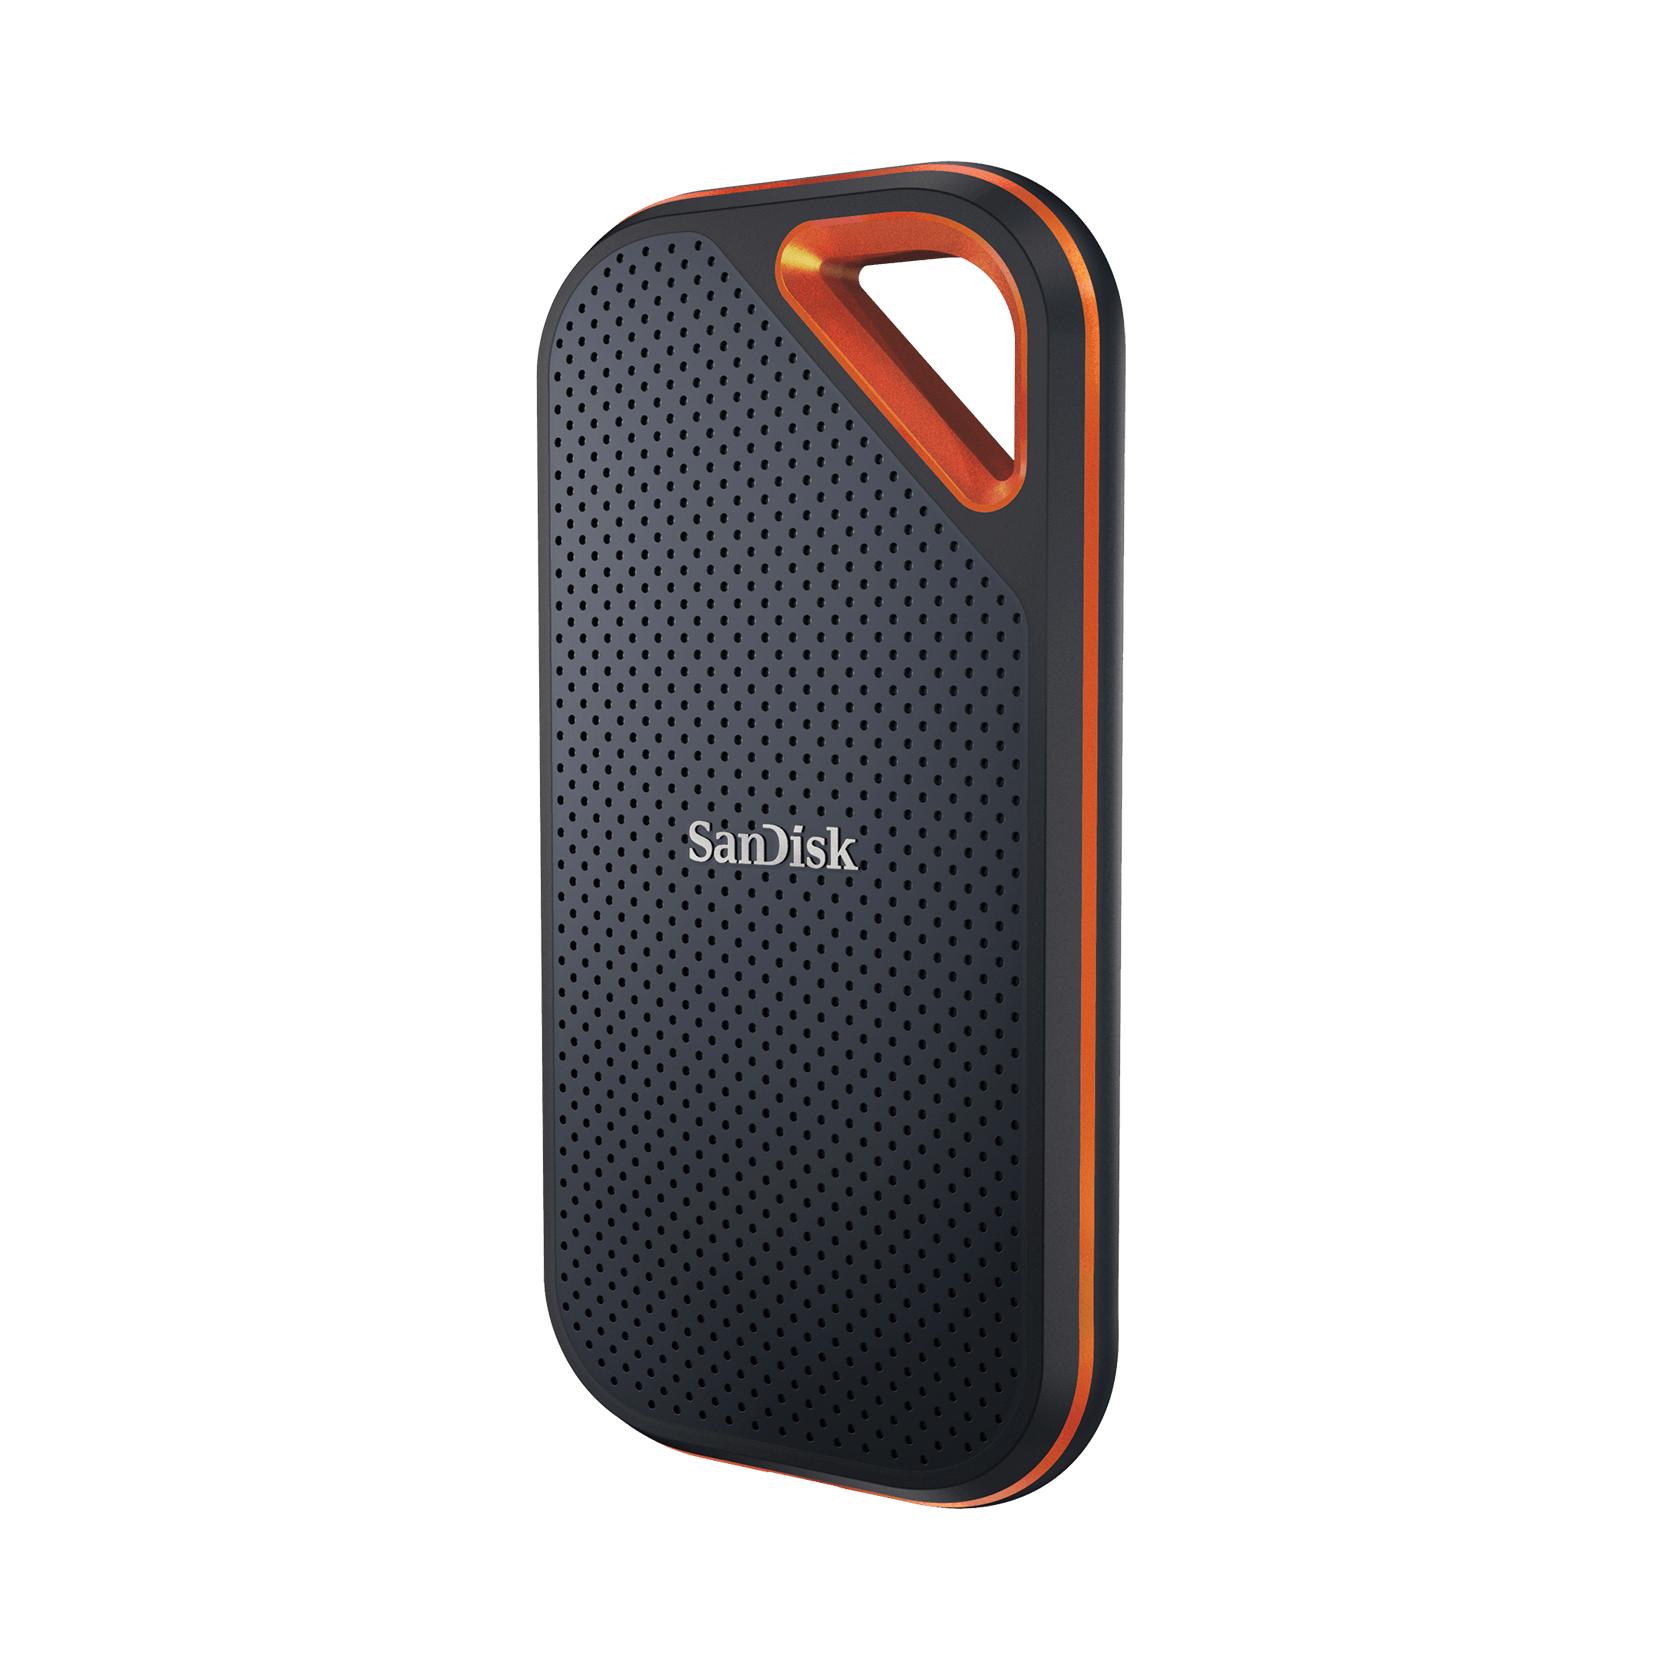 Sandisk Extreme PRO Portable SSD V2 2TB